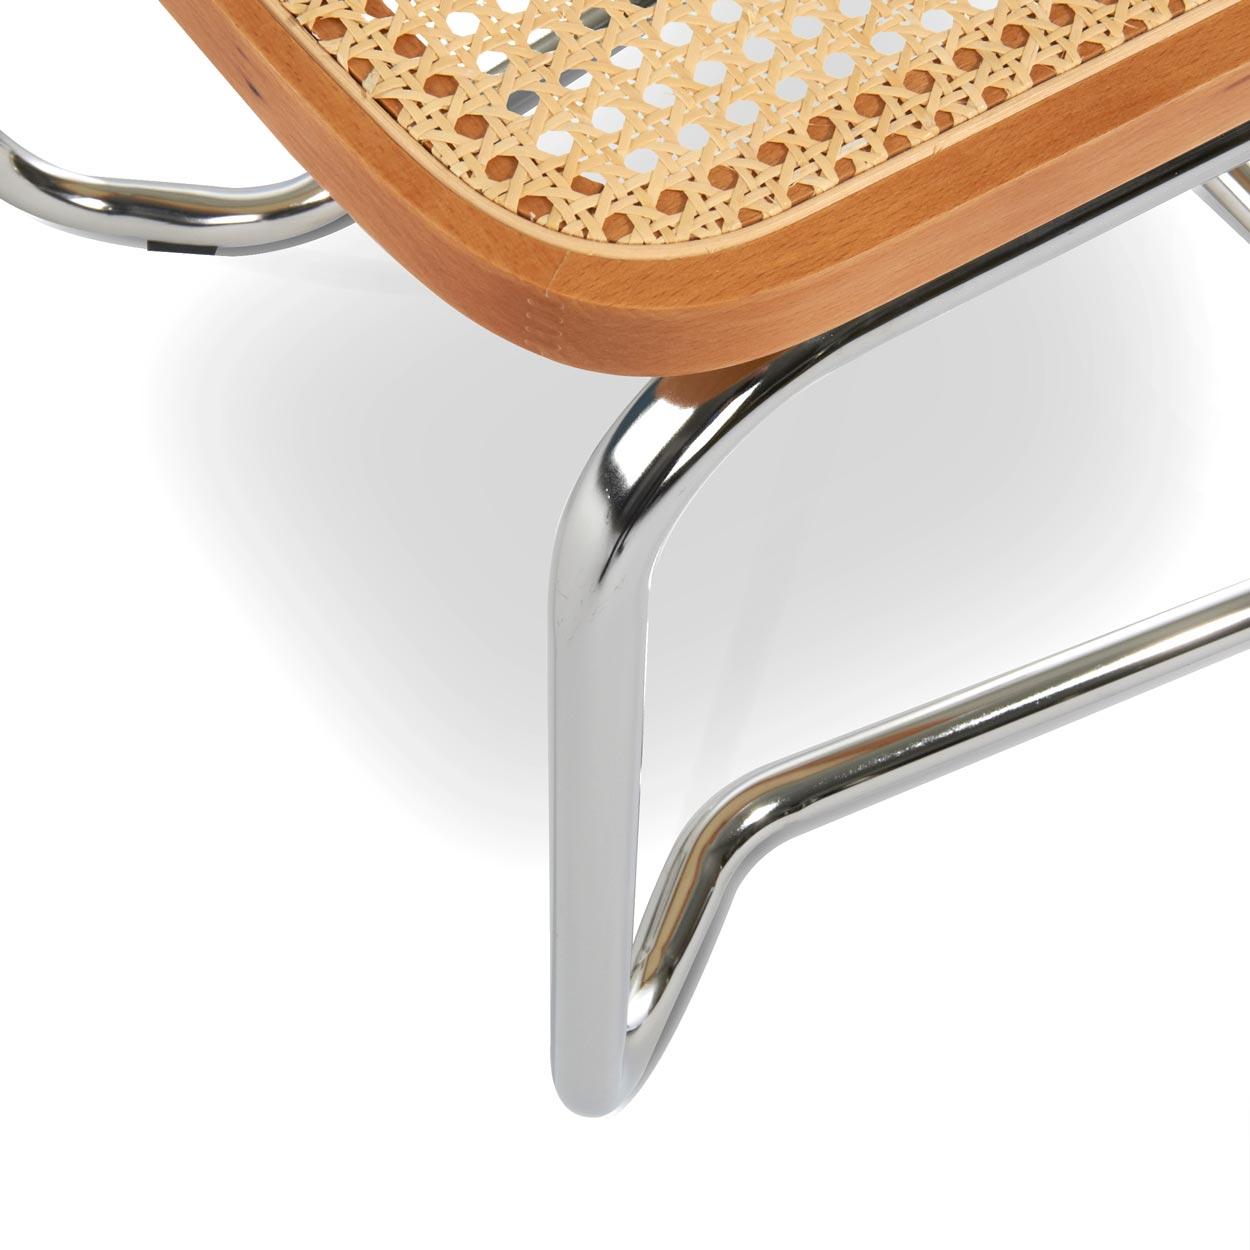 2er set schwingstuhl freischwinger esszimmerstuhl st hle for Esszimmerstuhl metall